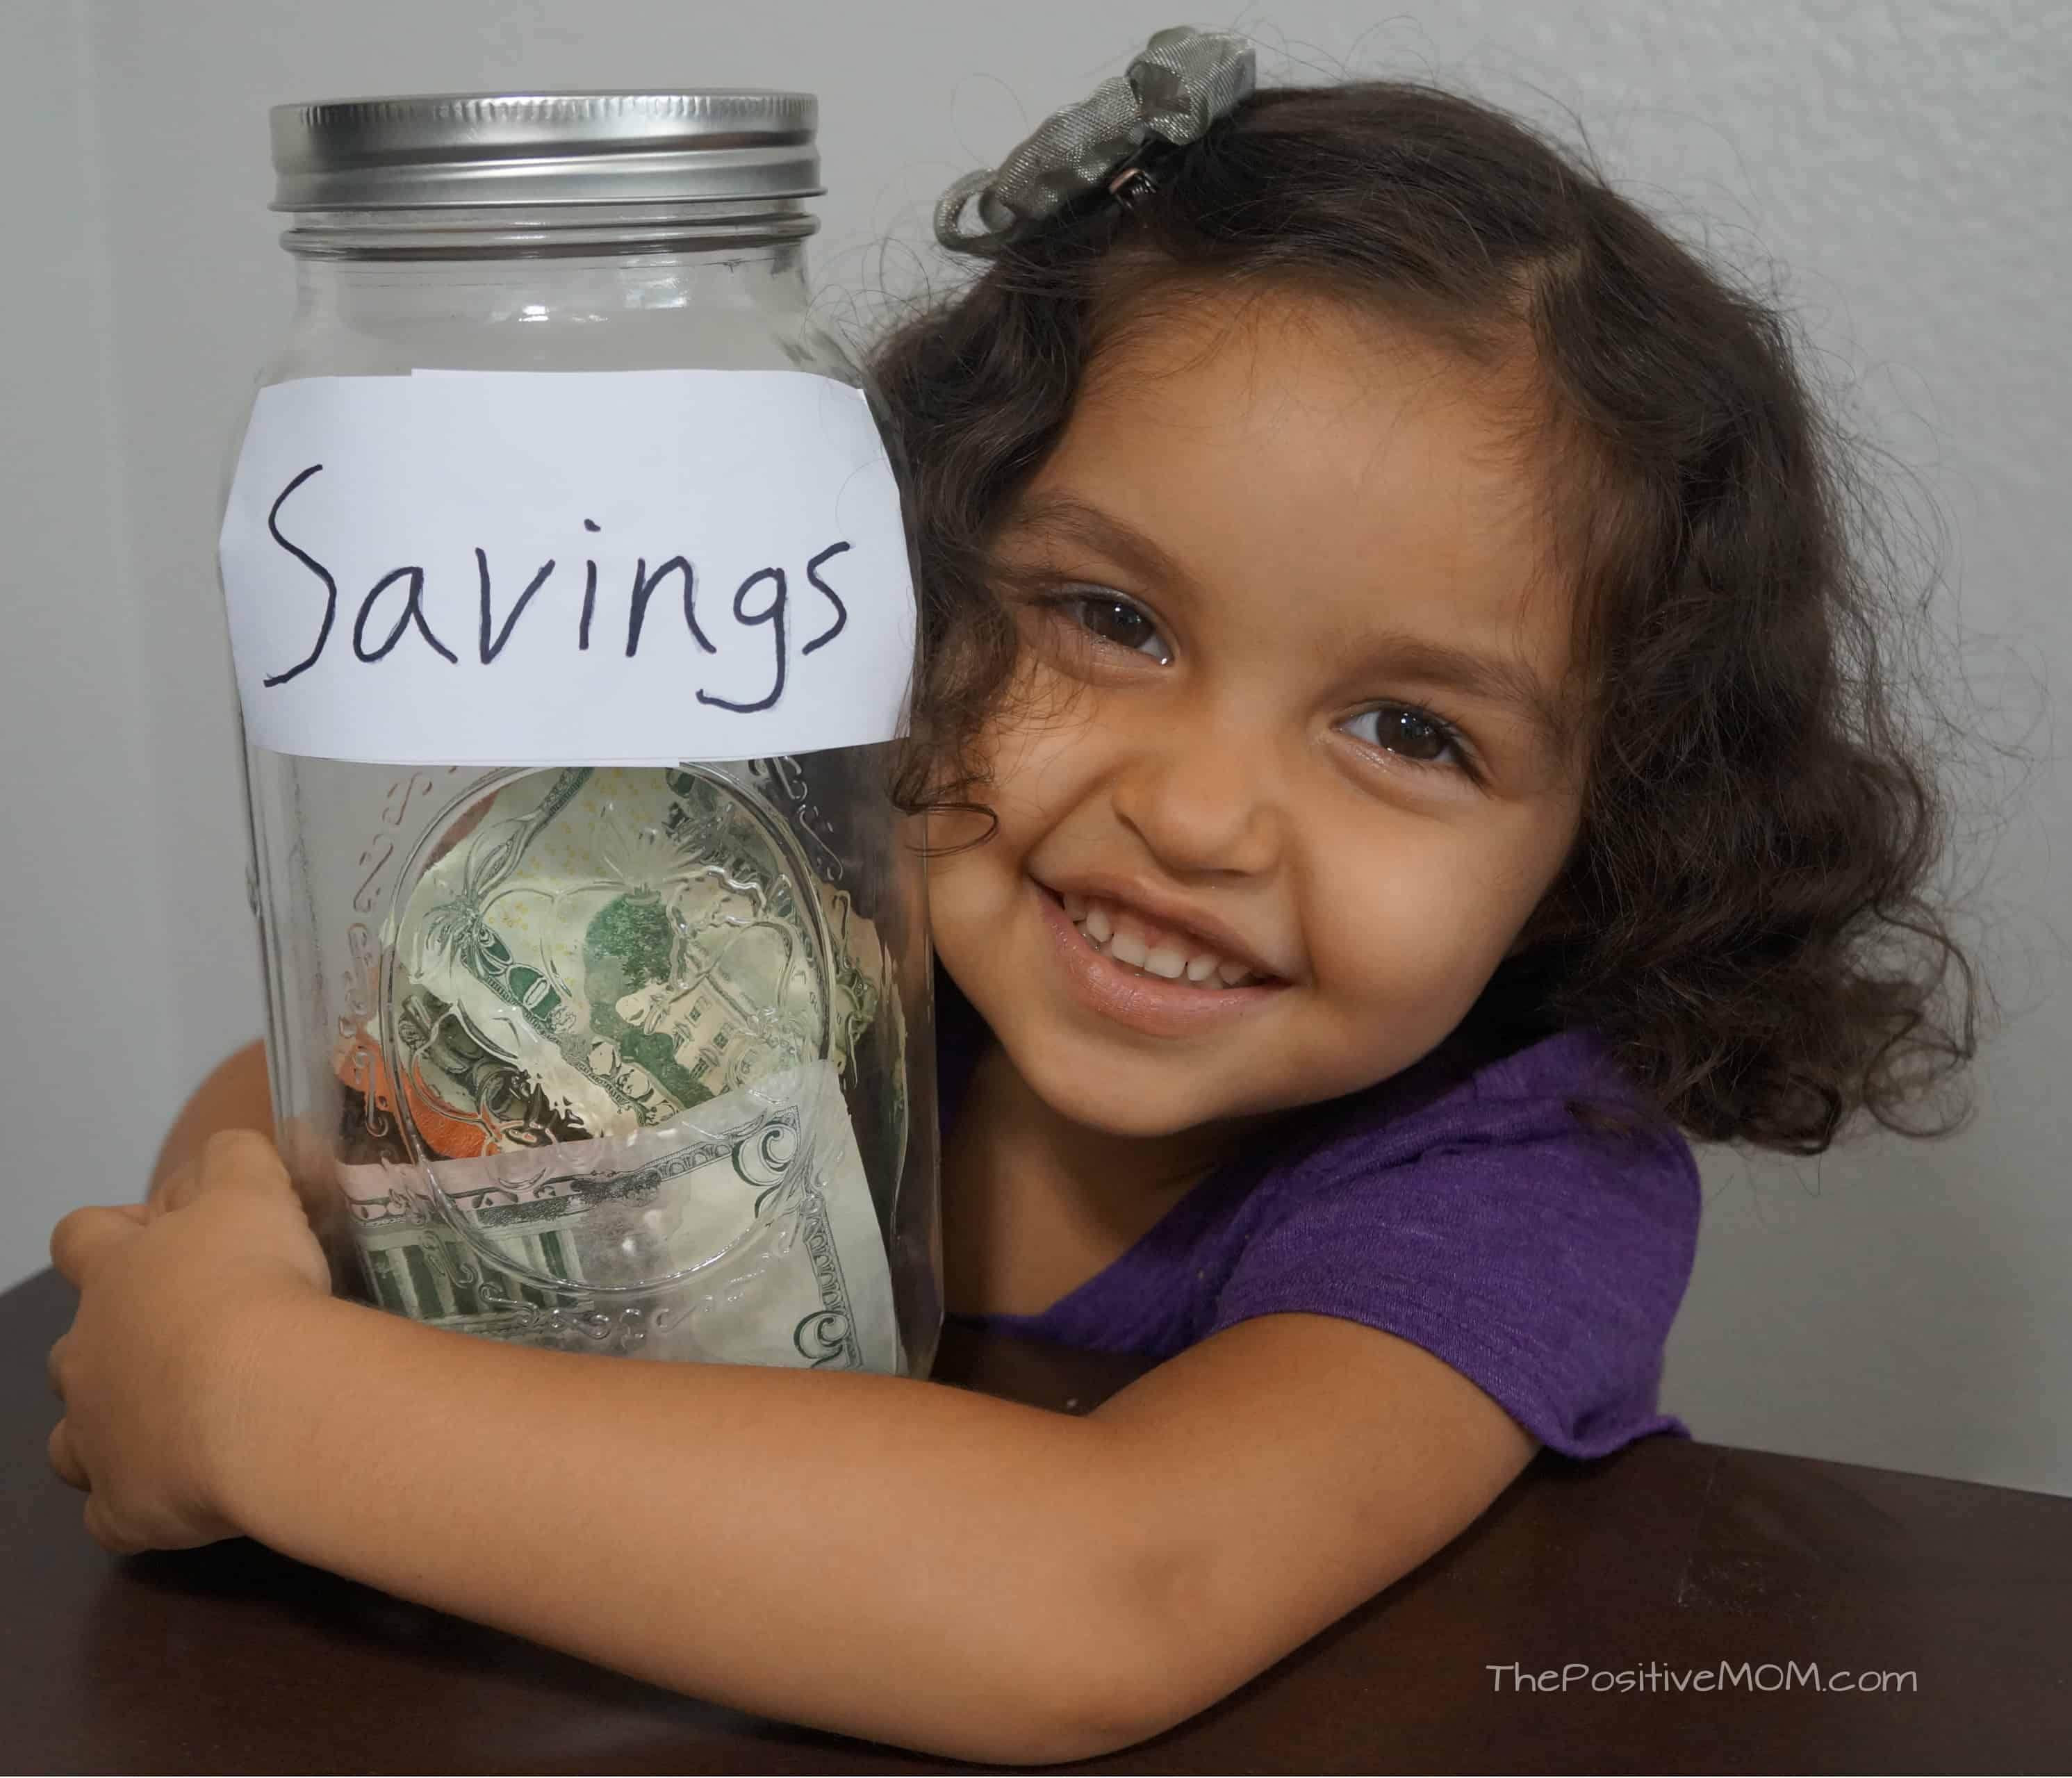 Teaching kids to understand money